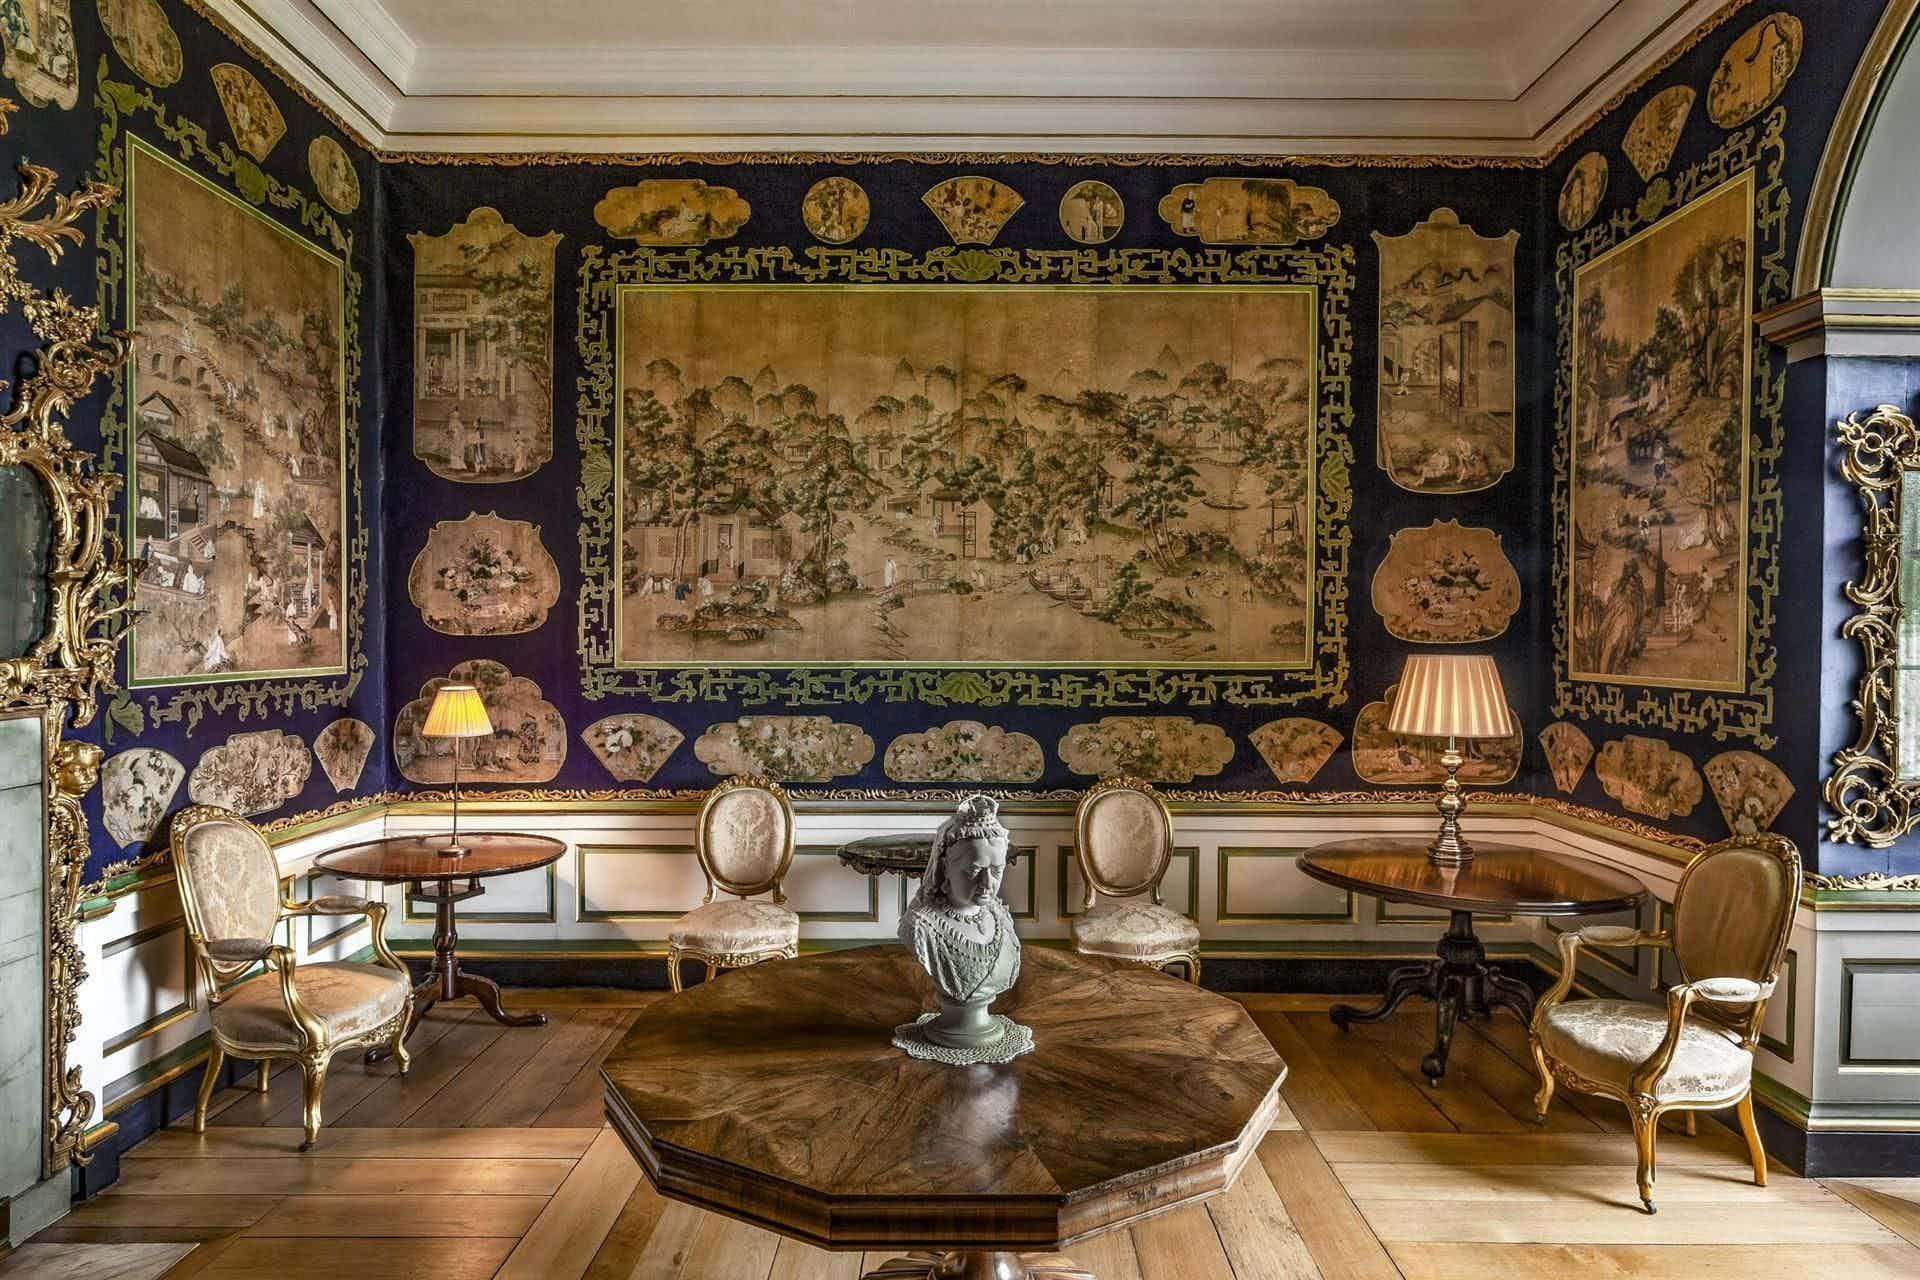 The Chinese Boudoir , Carton House